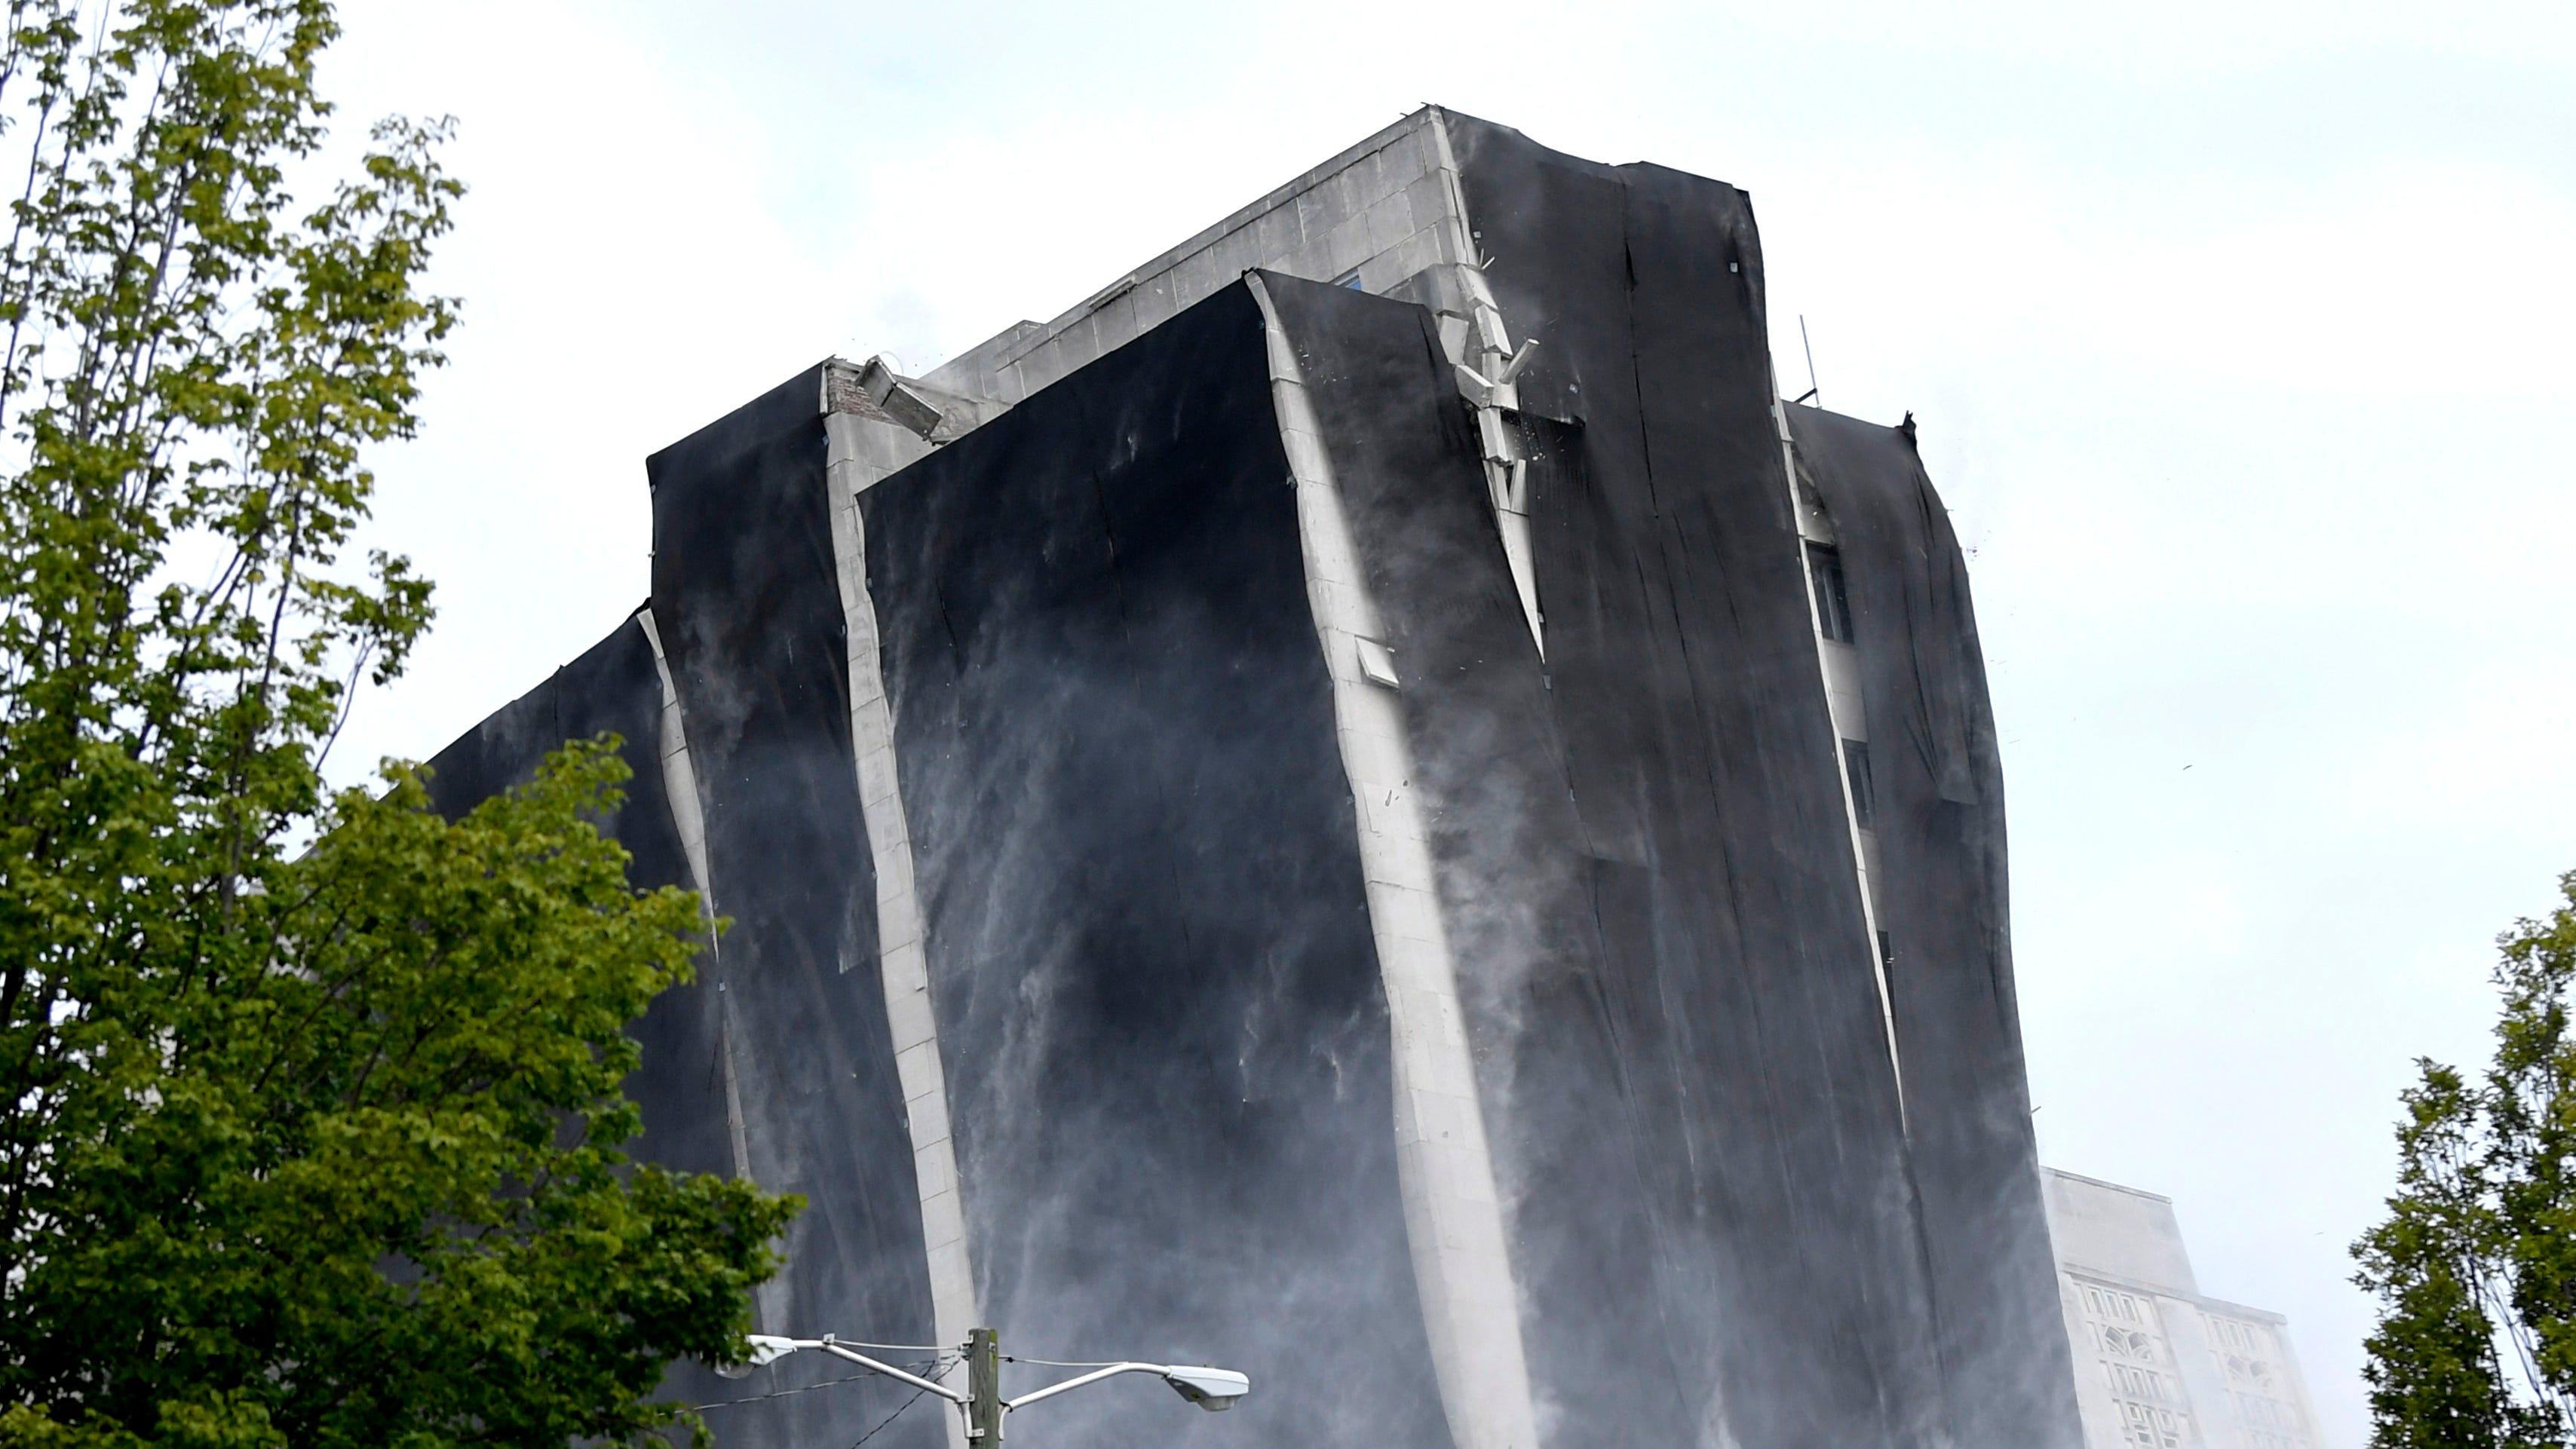 The historic Sullivan Tower implodes in Nashville on Saturday,  July 21, 2018.